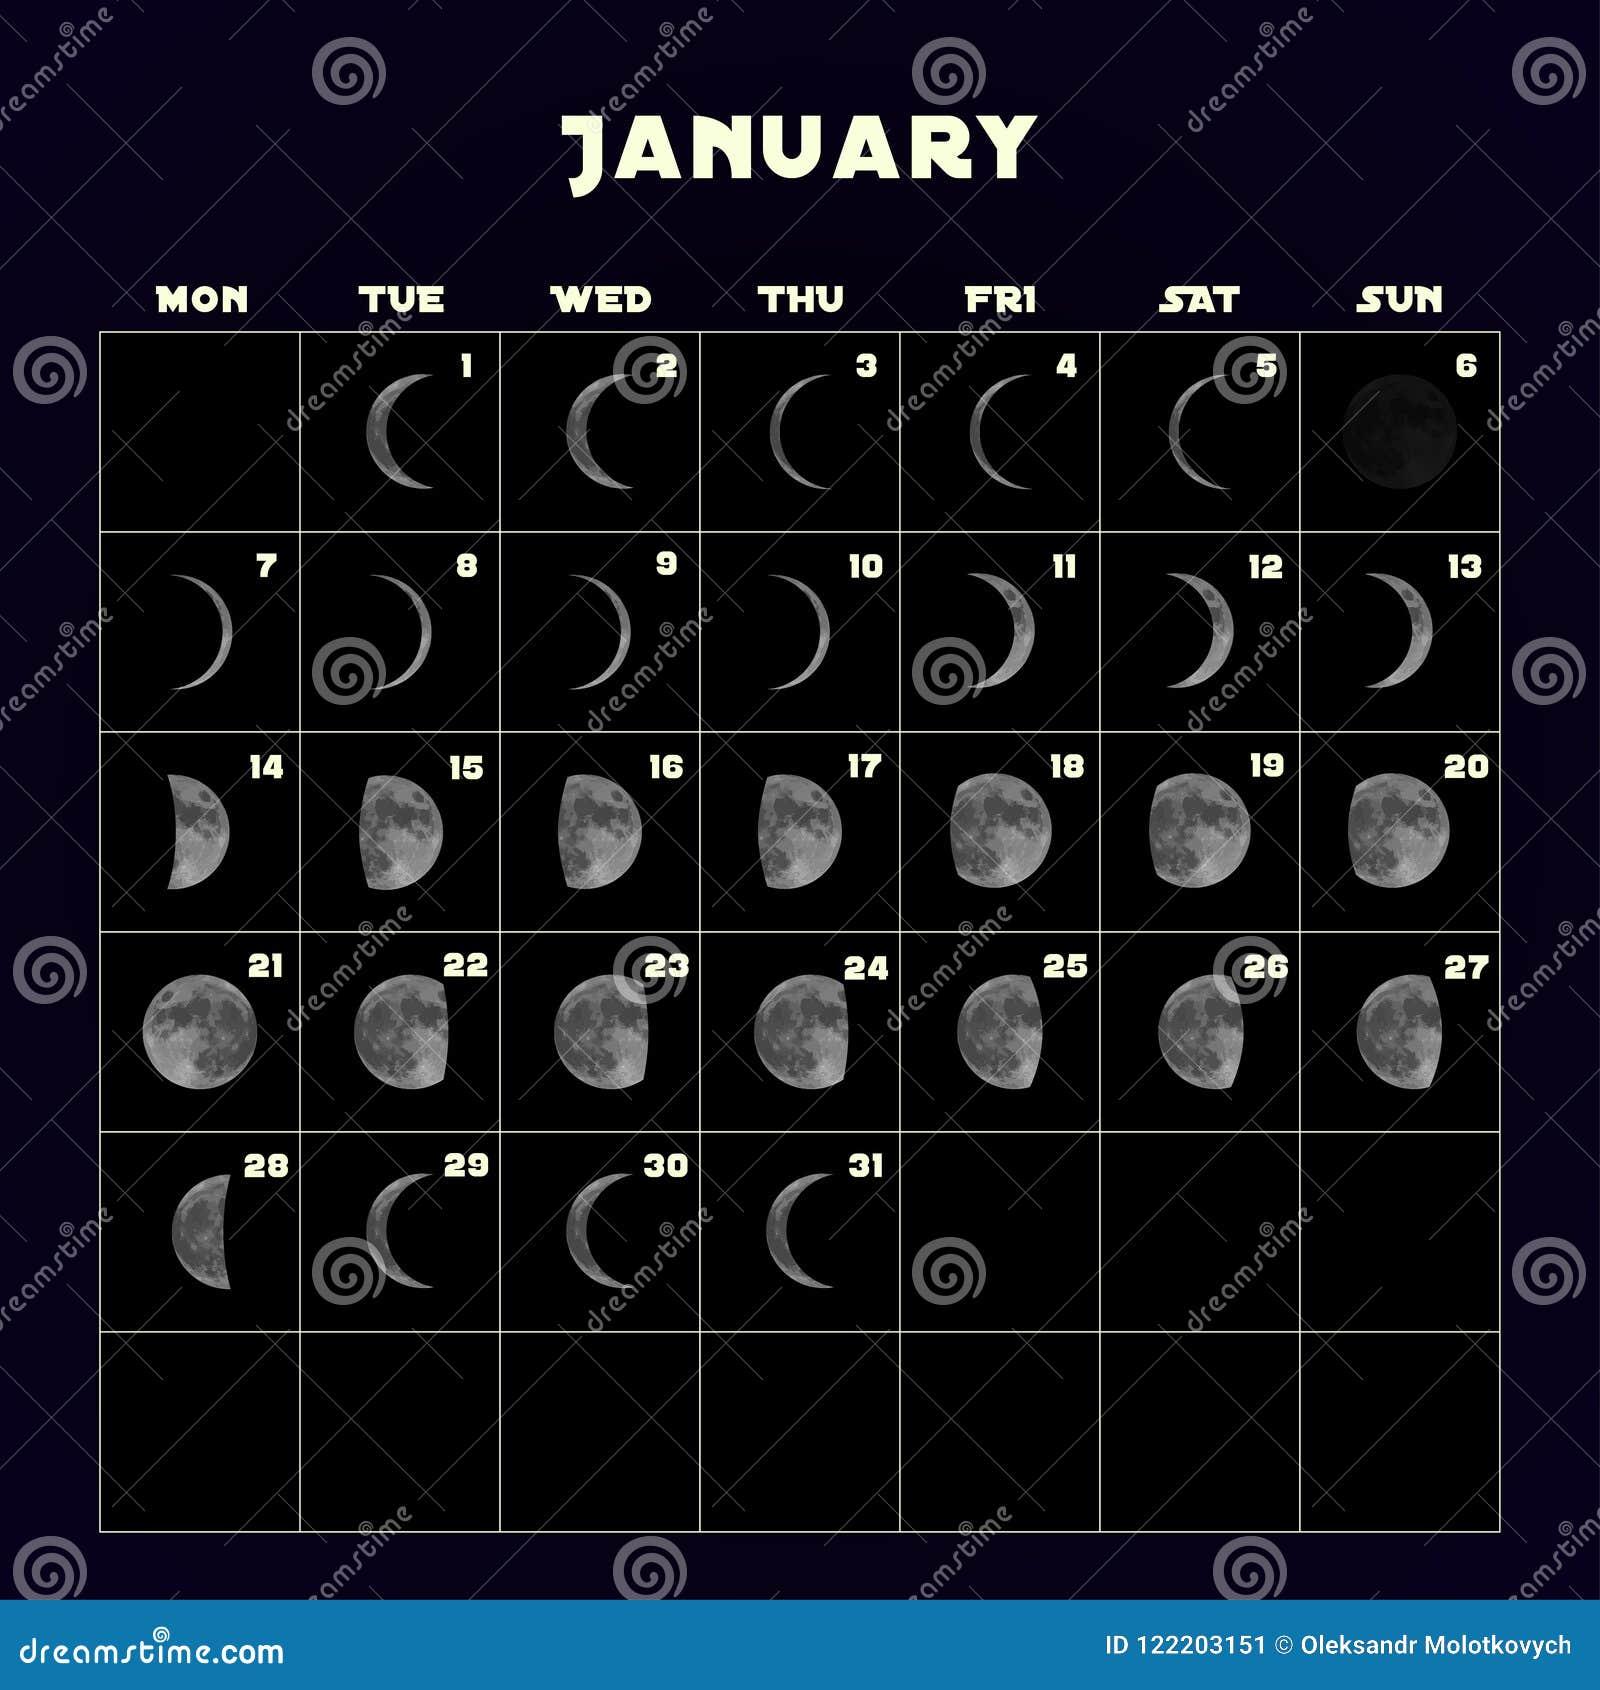 Moon Phase Calendar 2019 January Moon Phases Calendar For 2019 With Realistic Moon. January. Vector